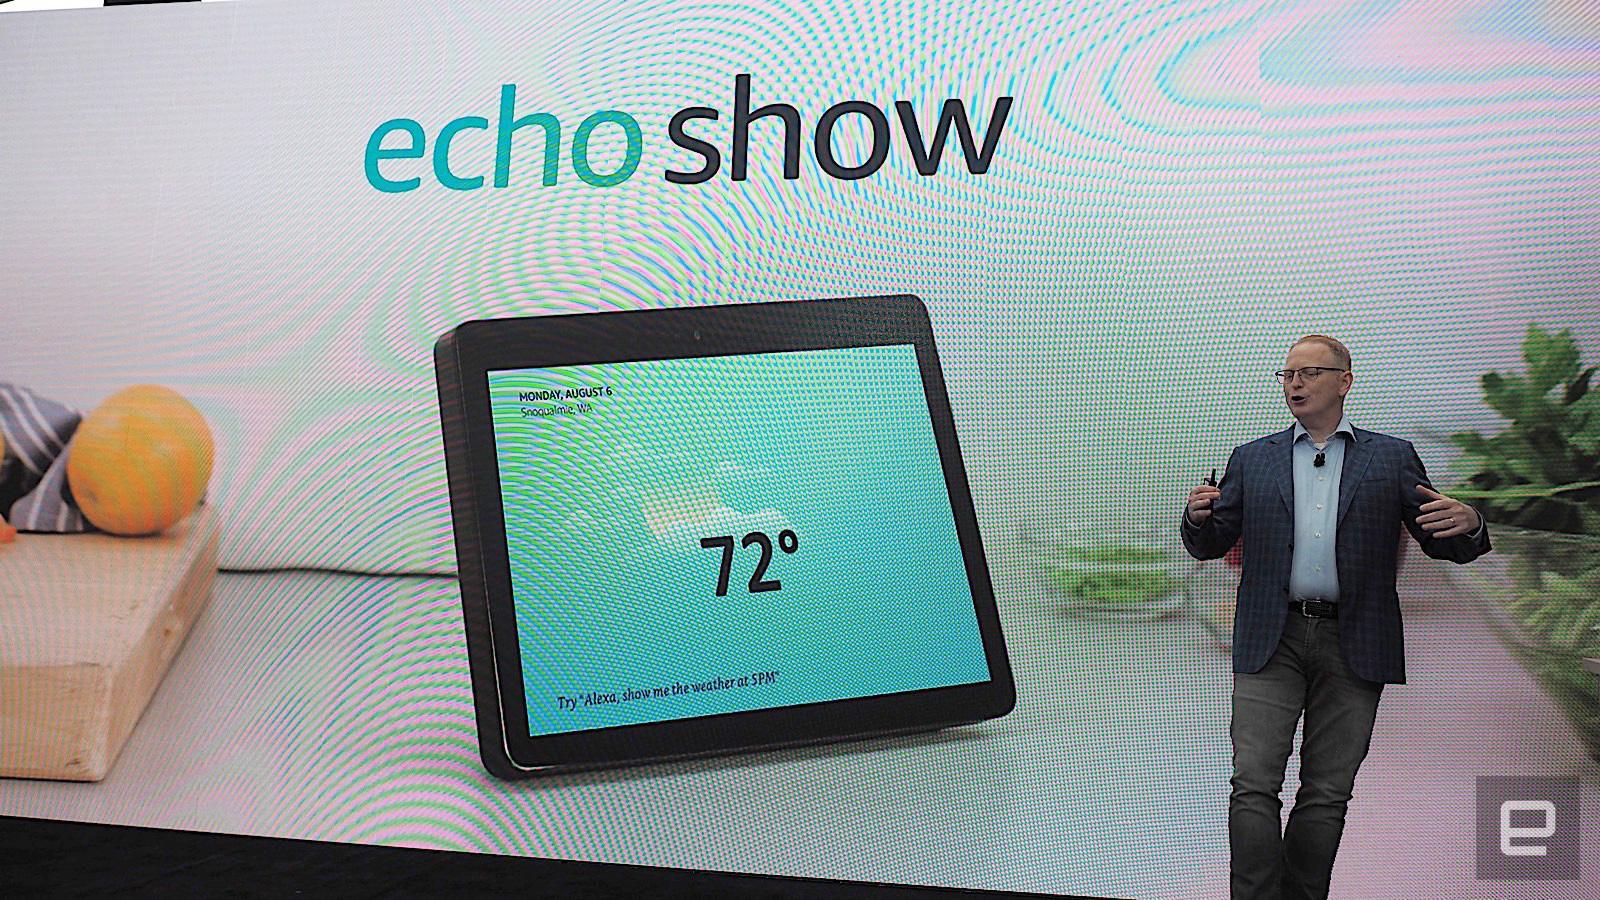 Amazon新EchoShow显示�钇鹘�曾至10寸 喇叭不再前置而是两侧发射